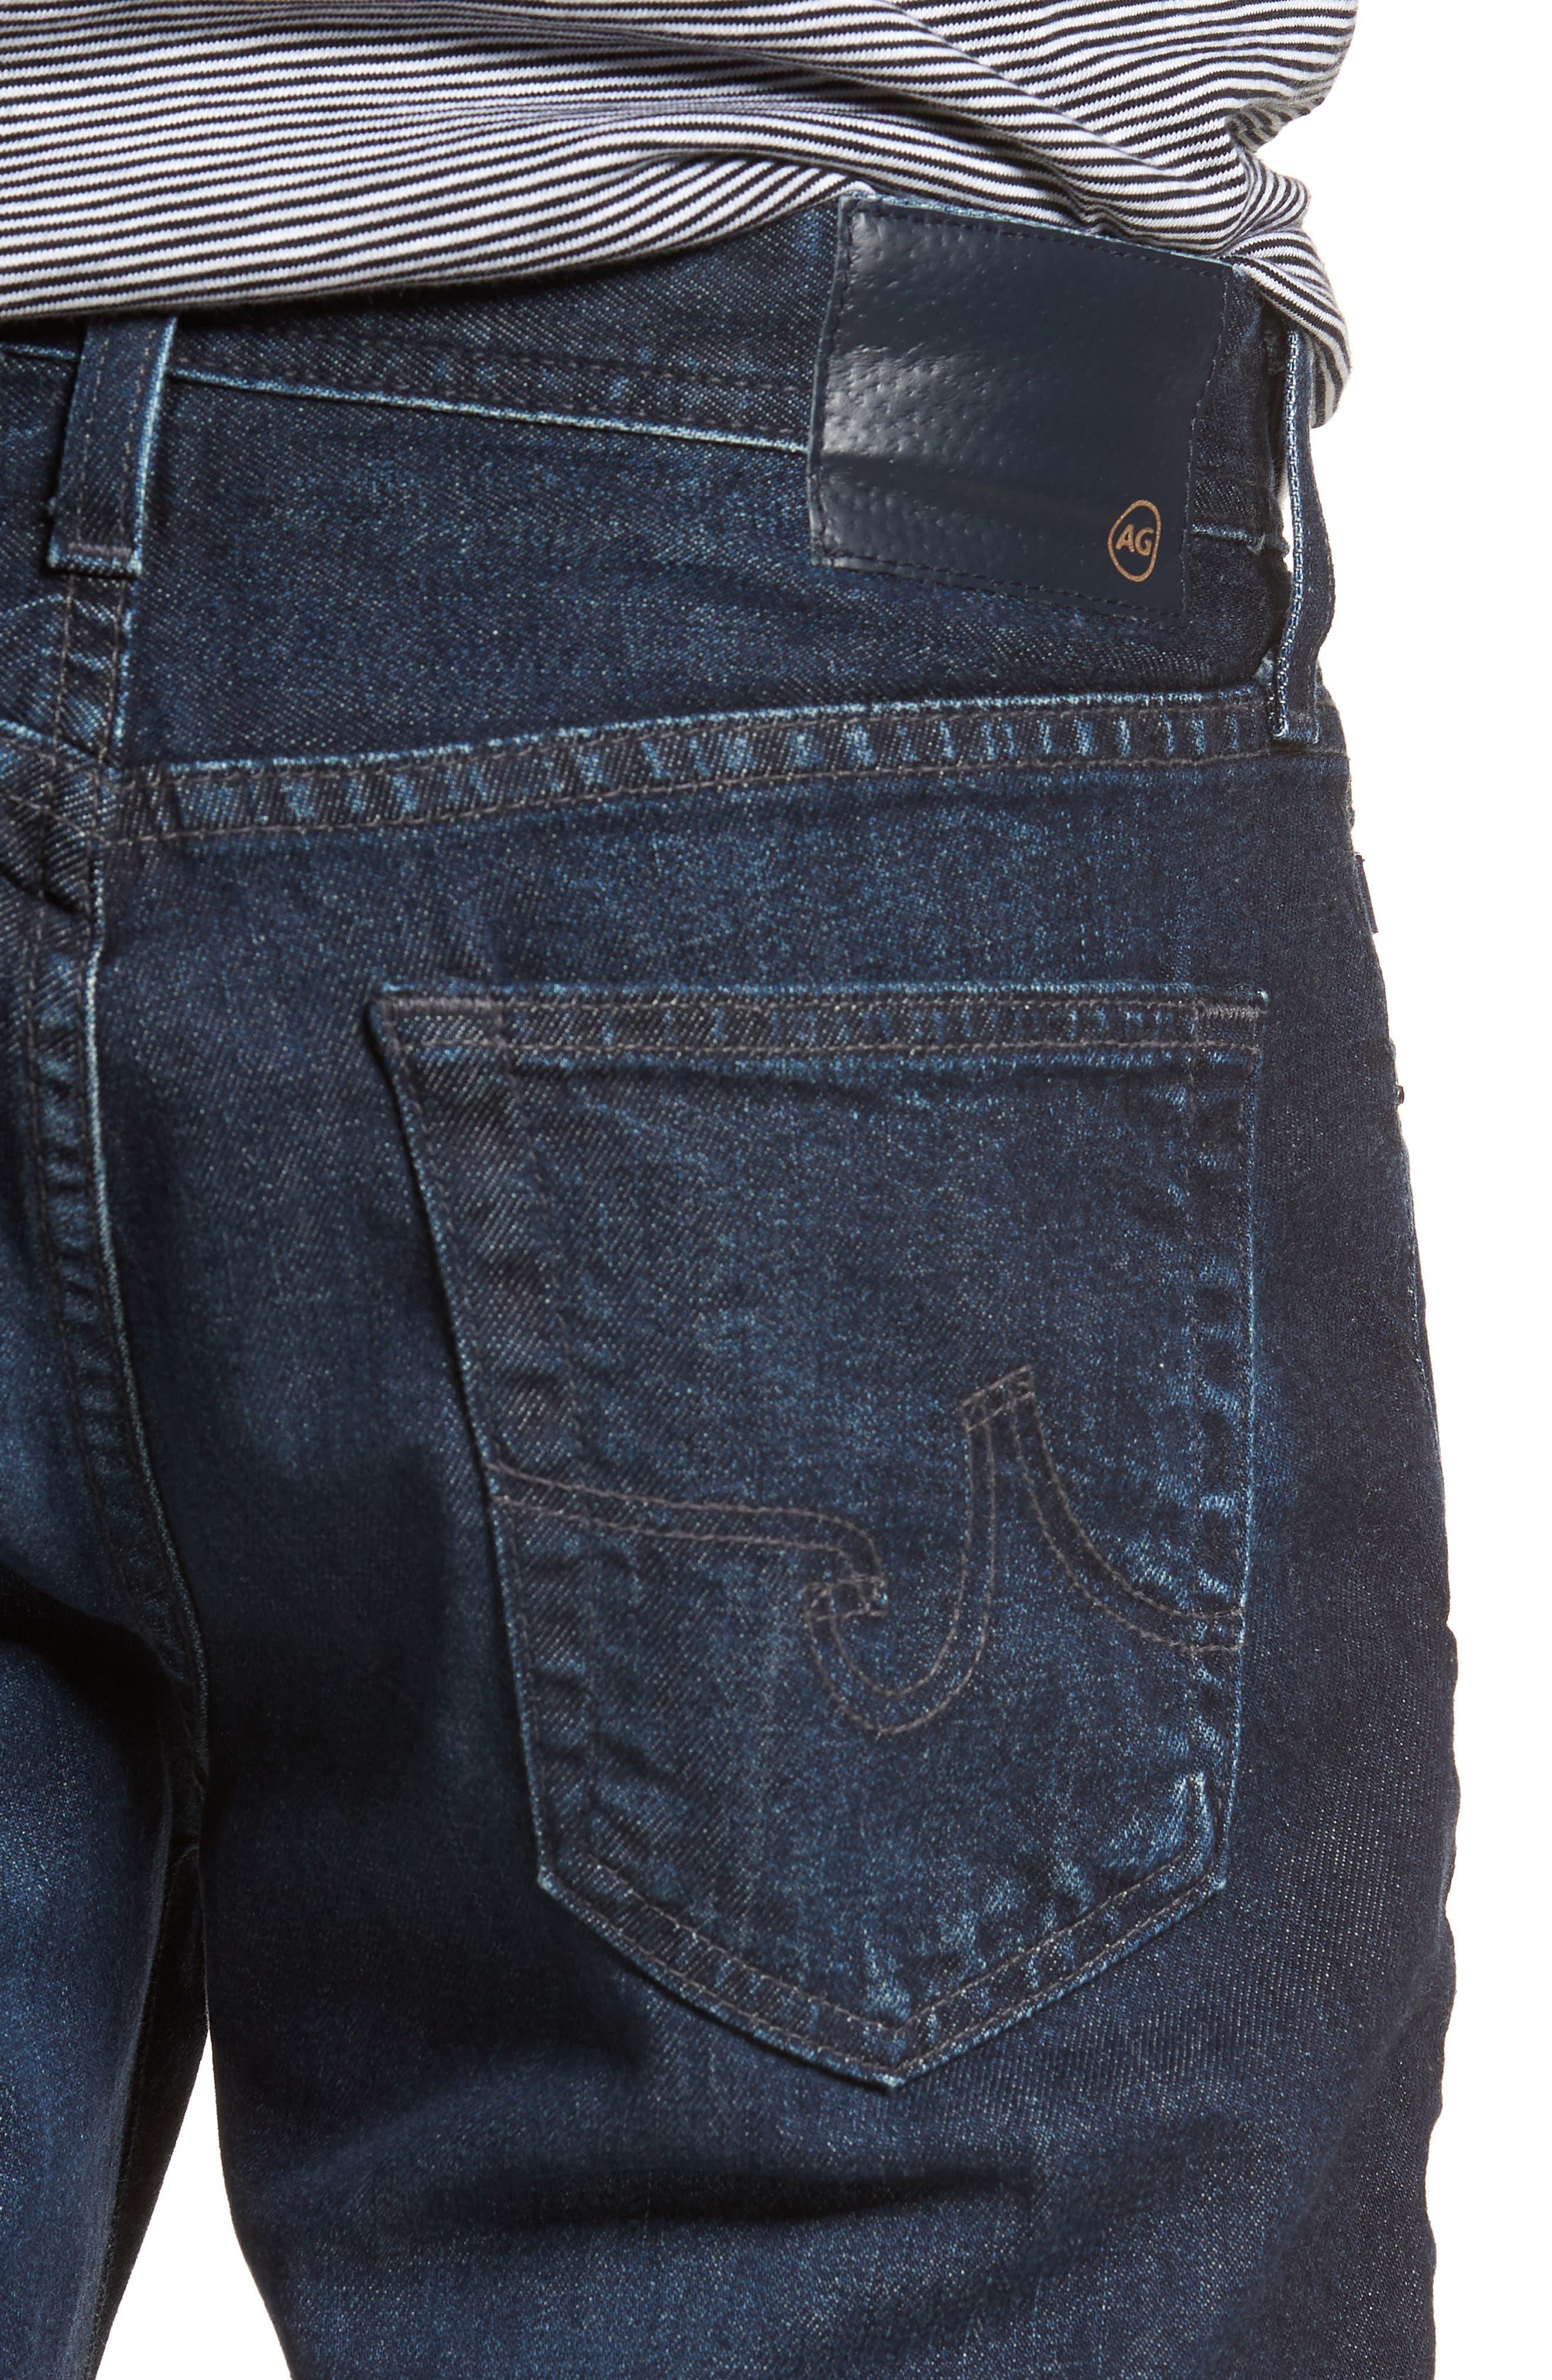 Graduate Slim Straight Leg Jeans,                             Alternate thumbnail 4, color,                             Stafford